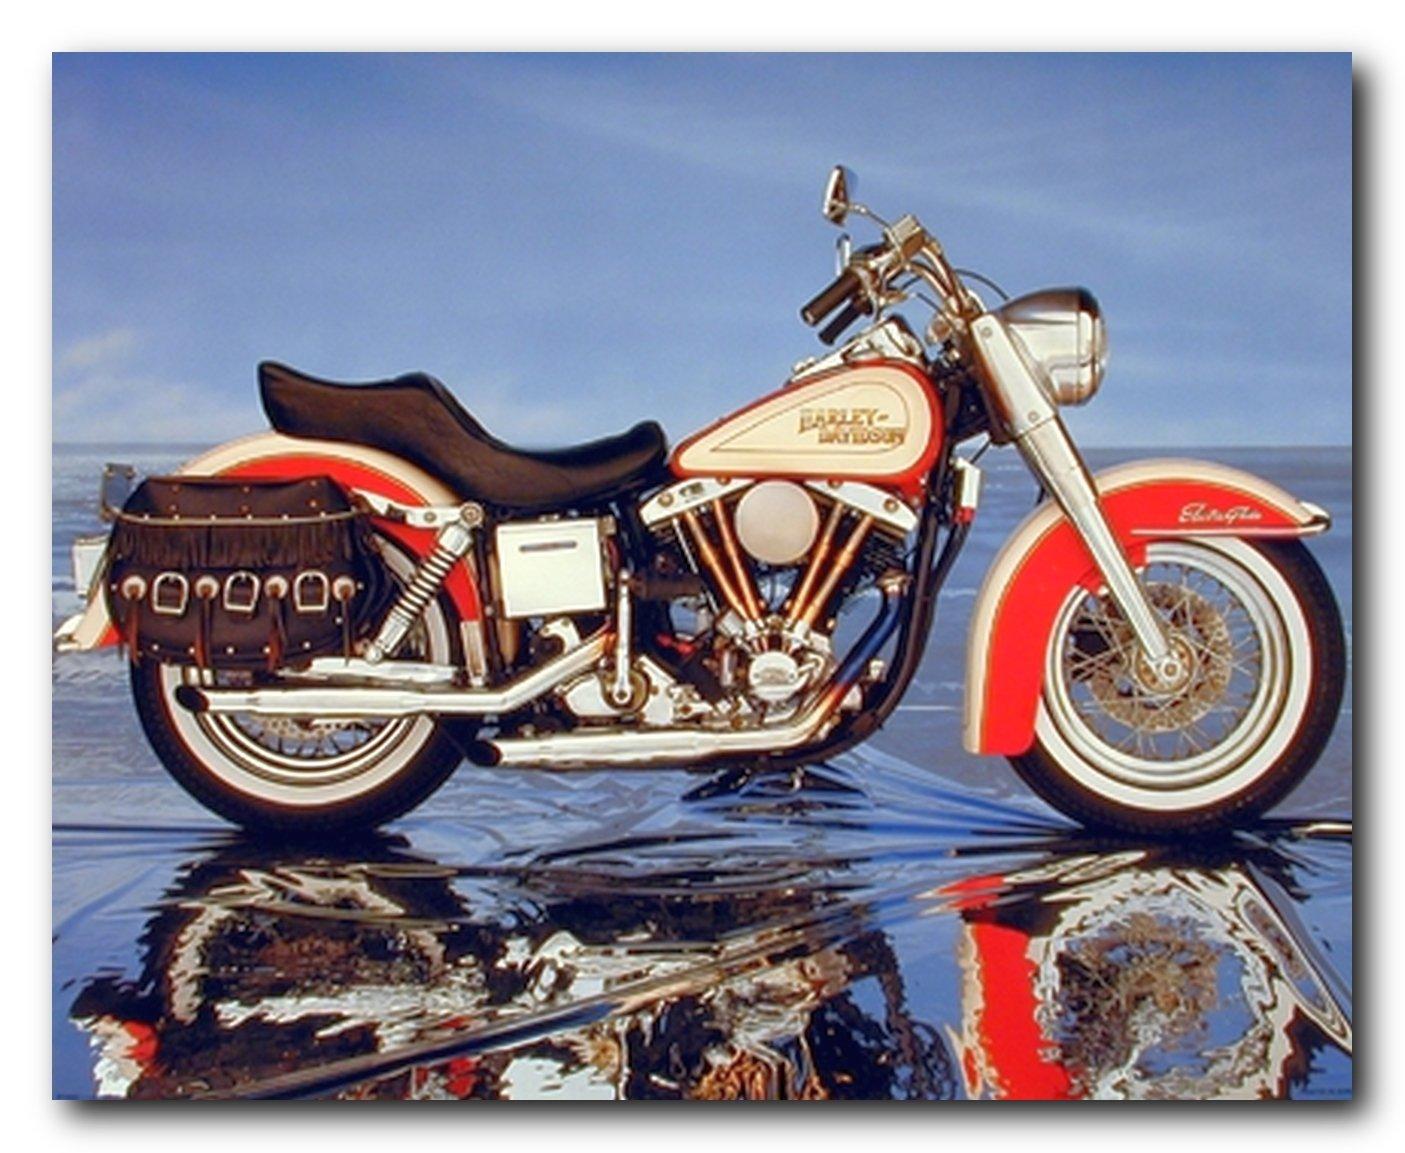 Vintage Motorcycle Harley Davidson Electra Glide Wall